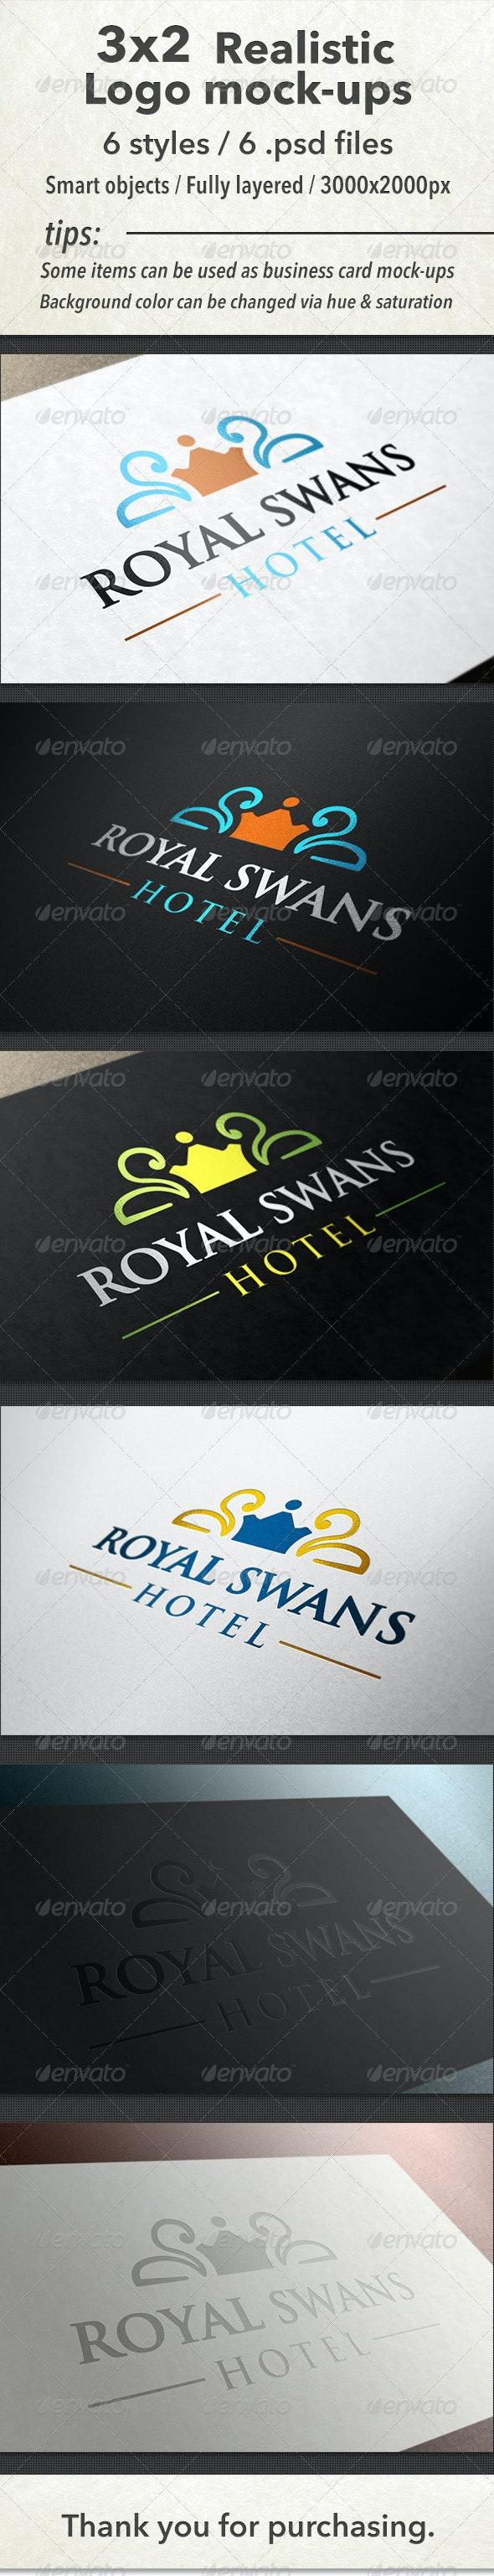 3x2 Realistic Logo Mock-Ups - Logo Product Mock-Ups